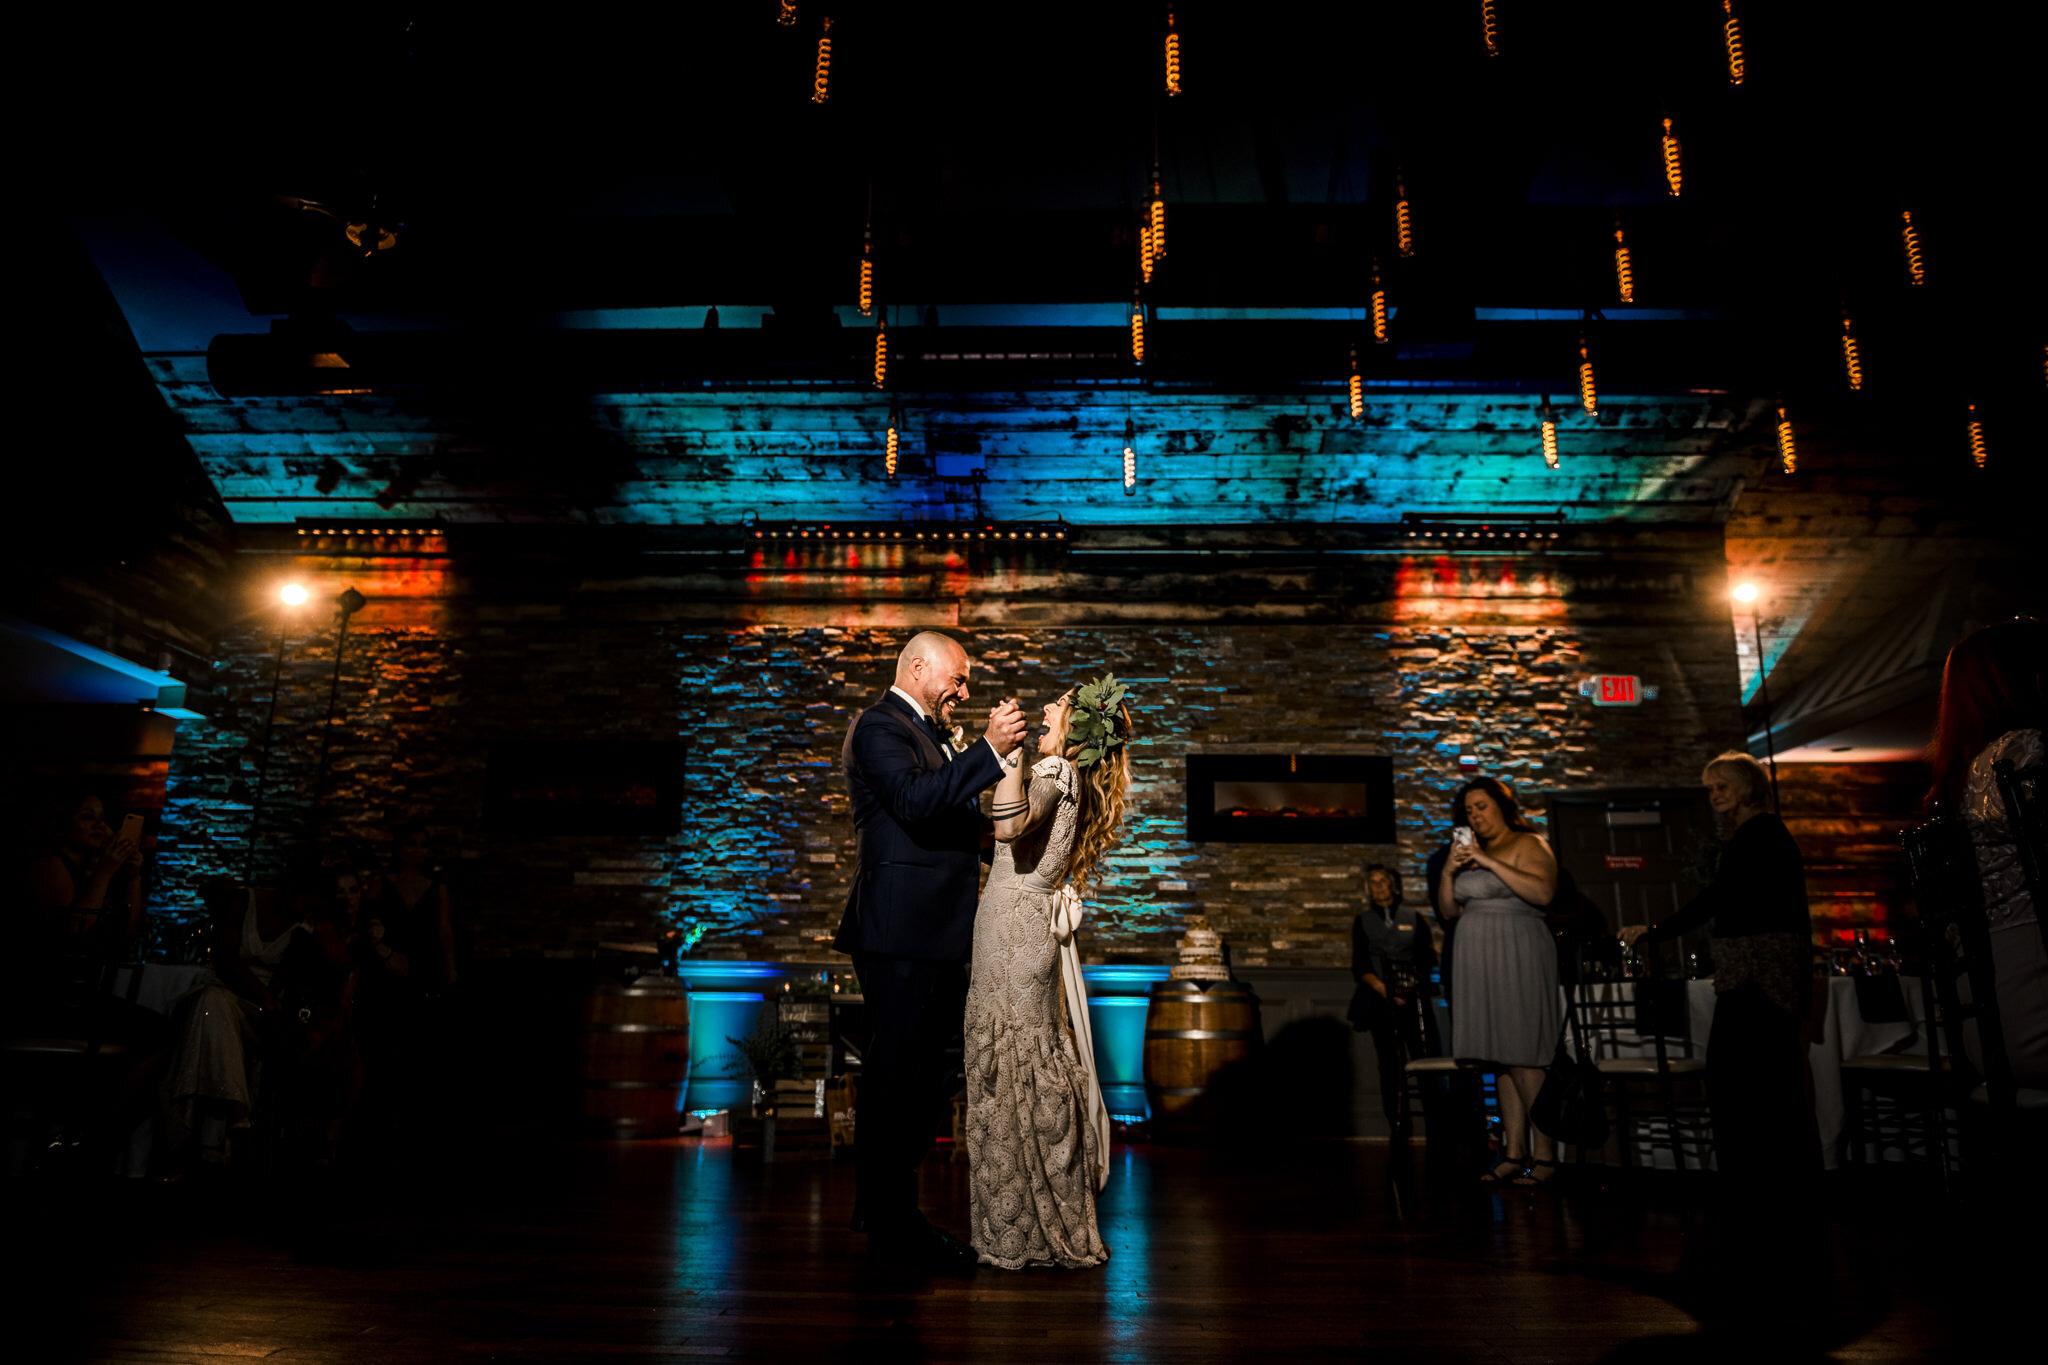 Hoffman-618-New-Jersey-Wedding-Photographer-41.JPG